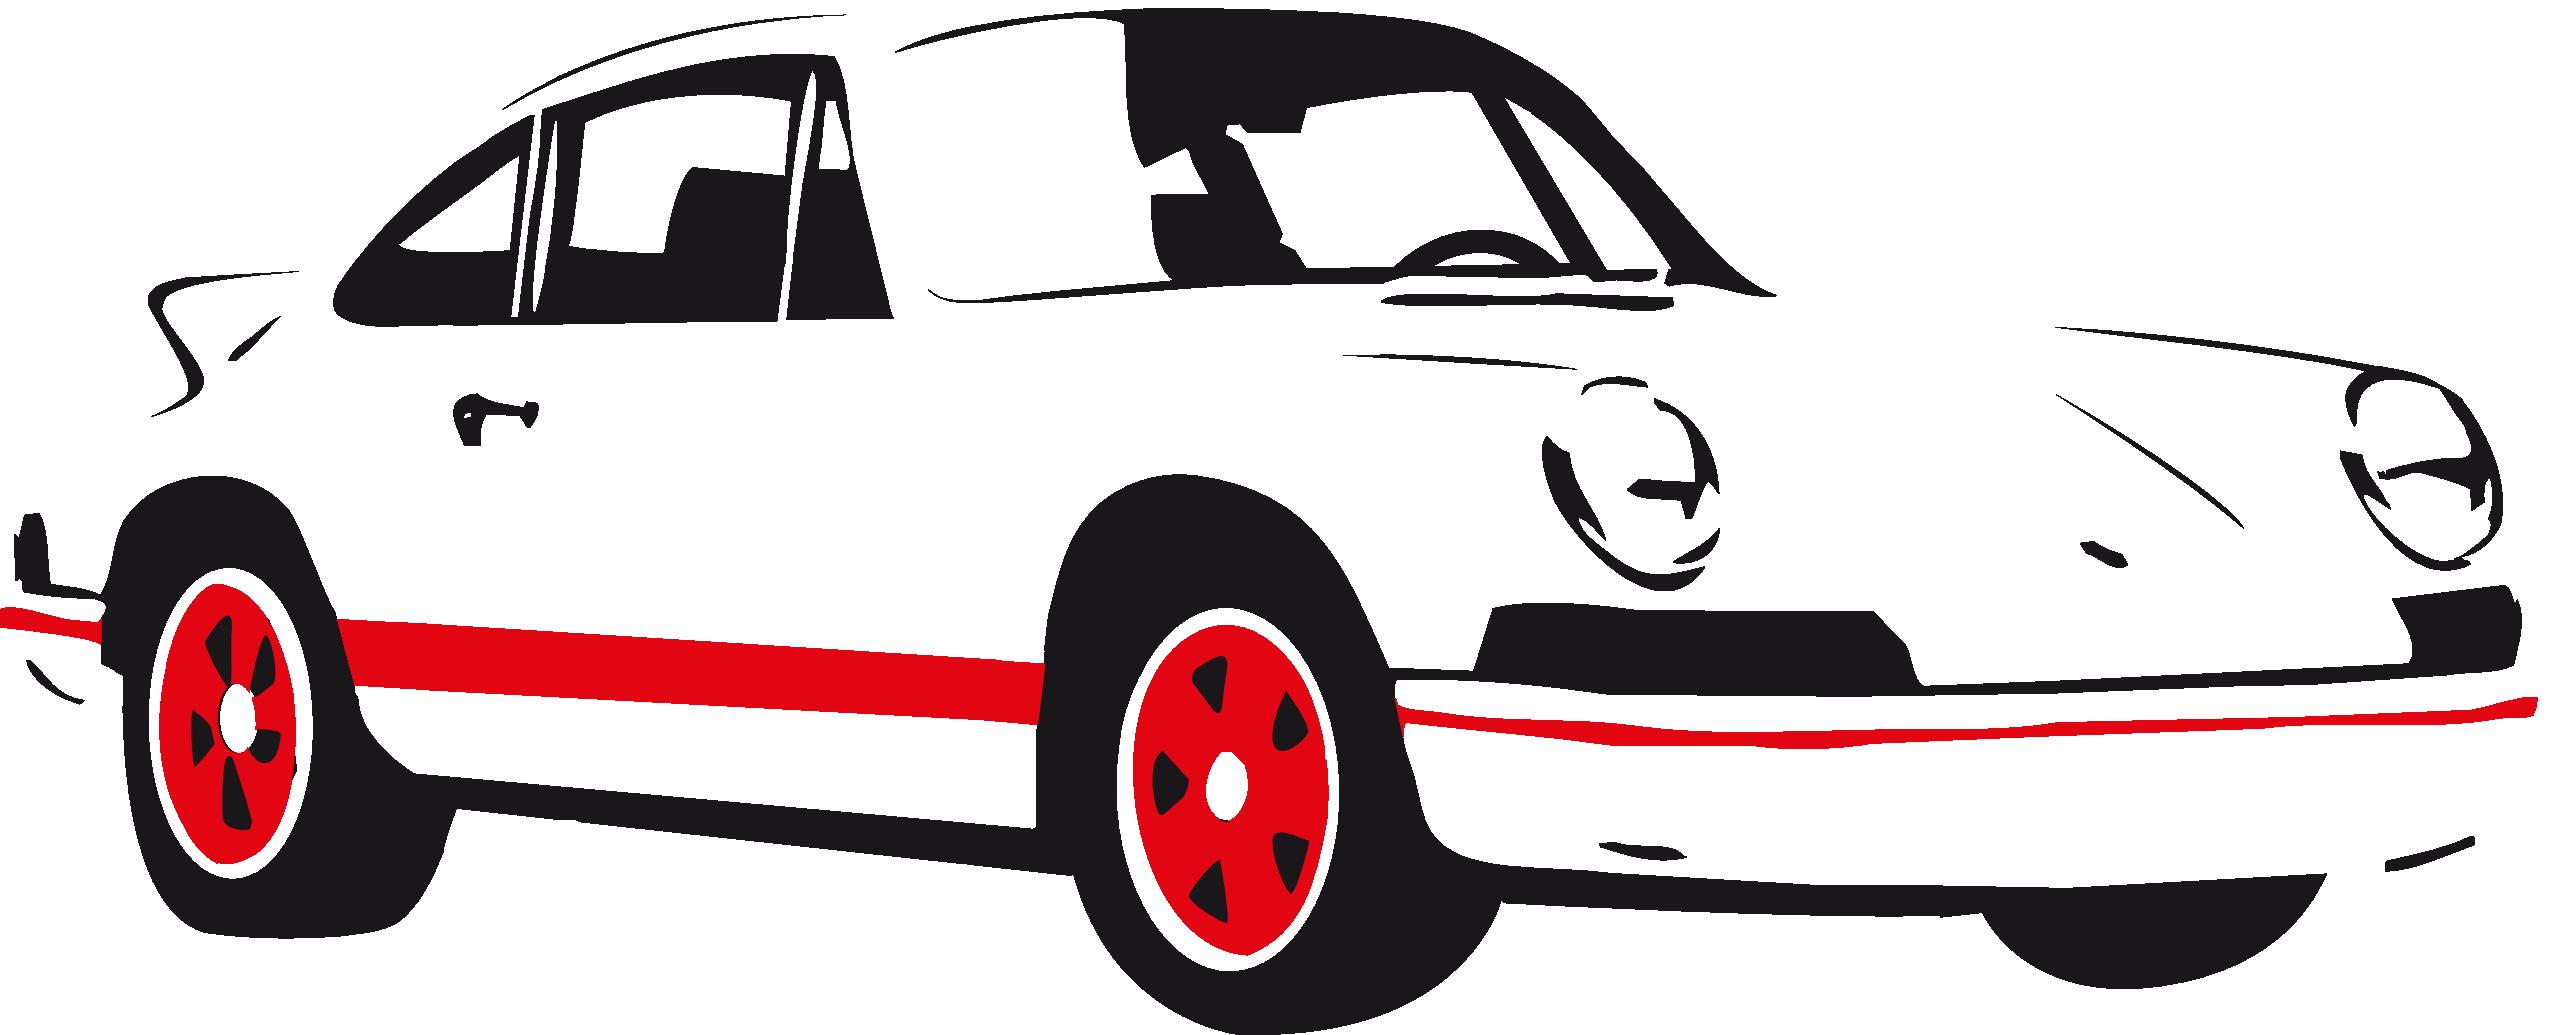 Jeep clipart vector. Race car silhouette clip